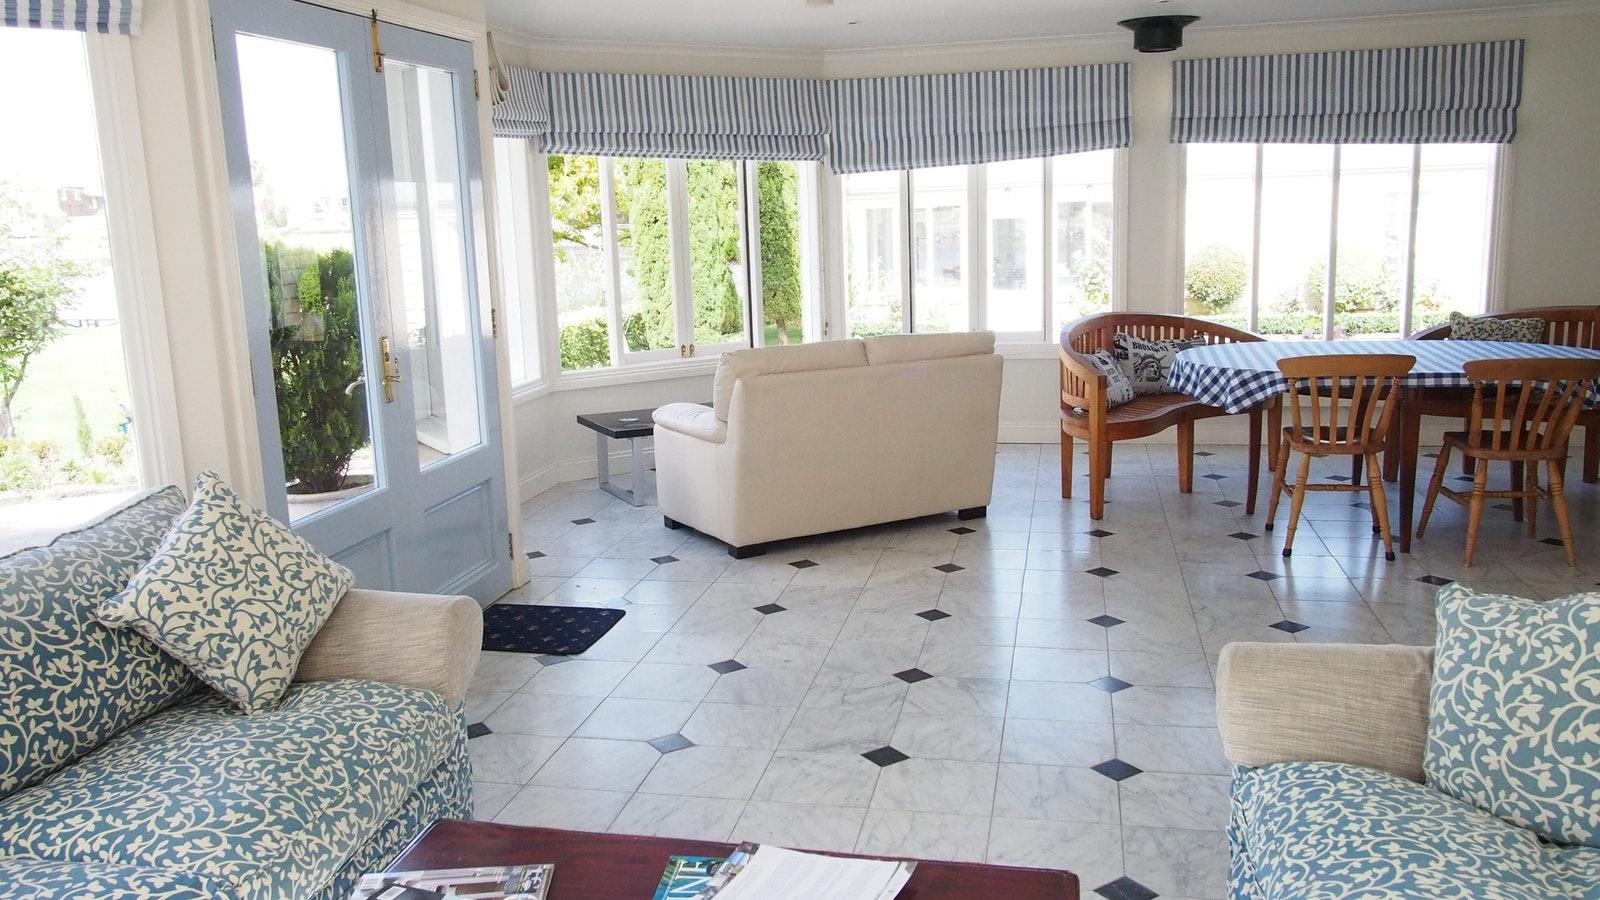 Douglas_riverside_lounge_in_the_garden_house